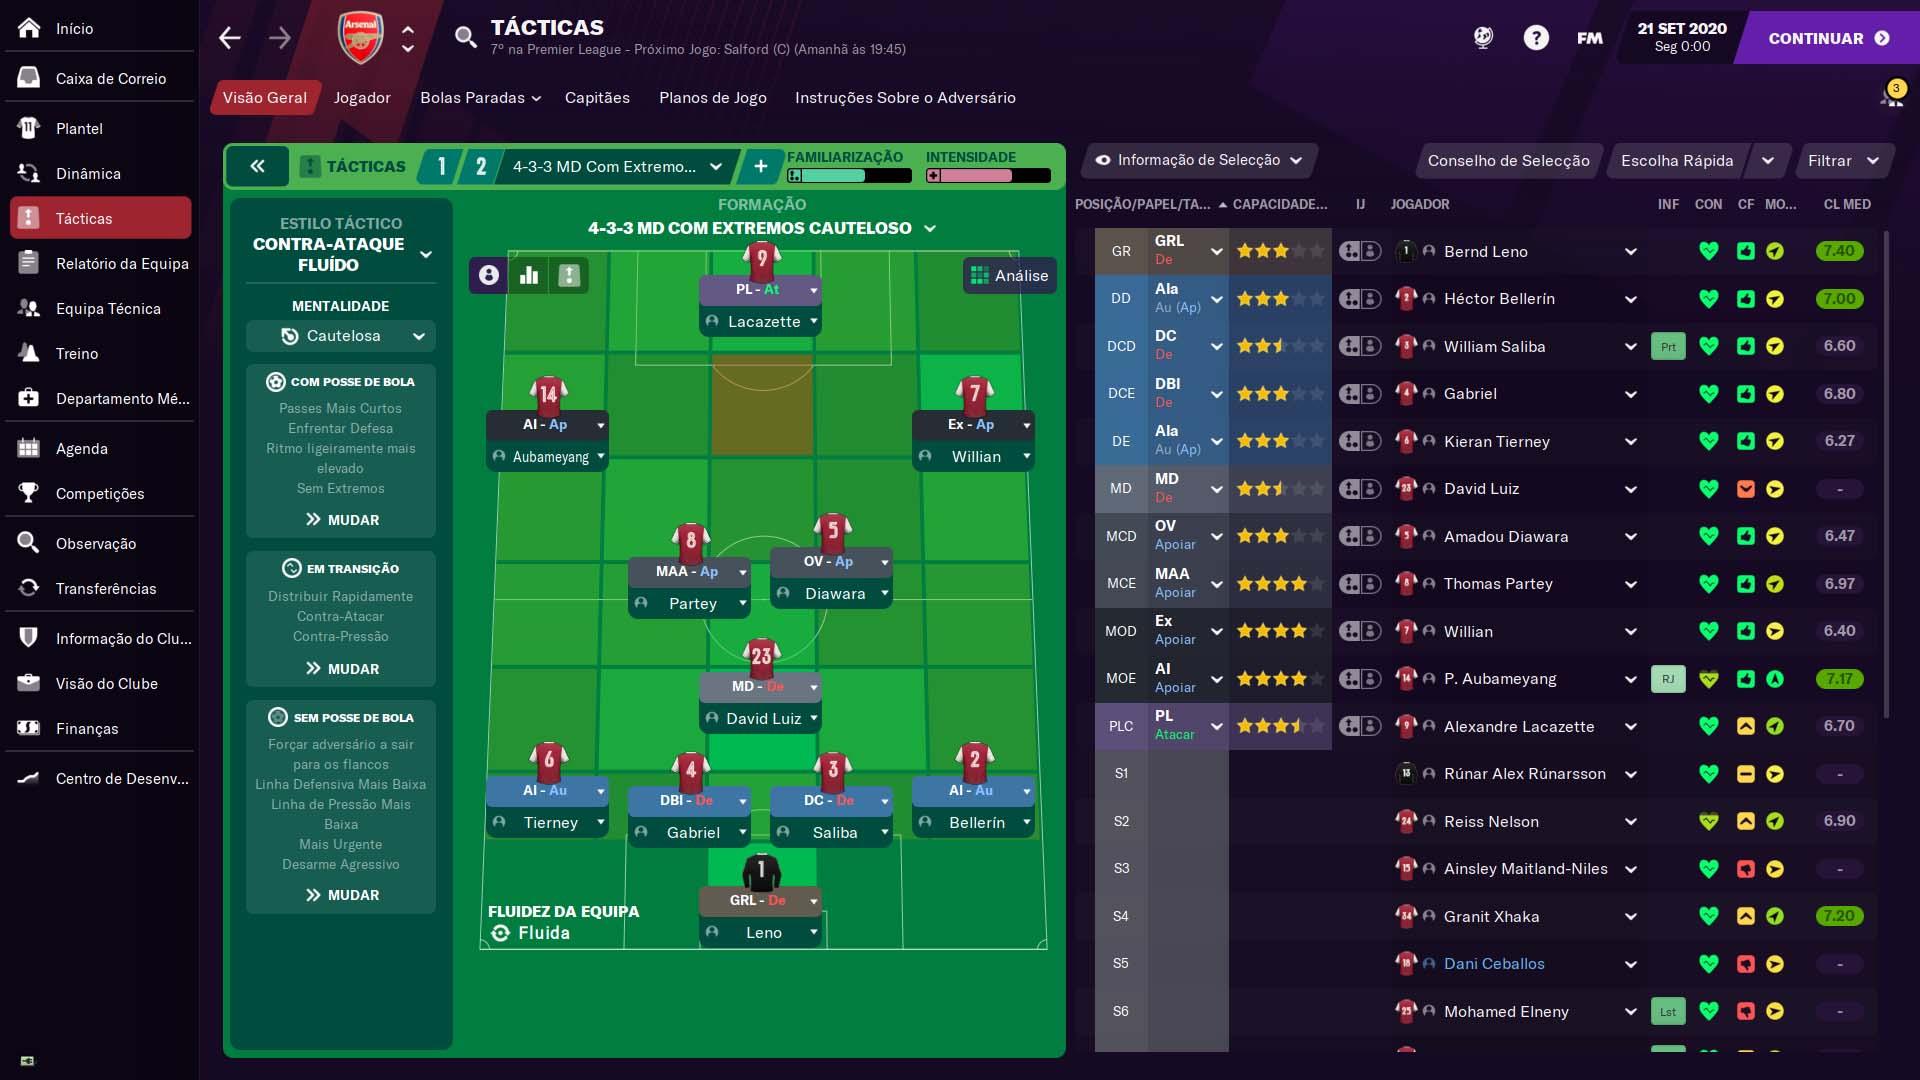 táticas football manager 2021